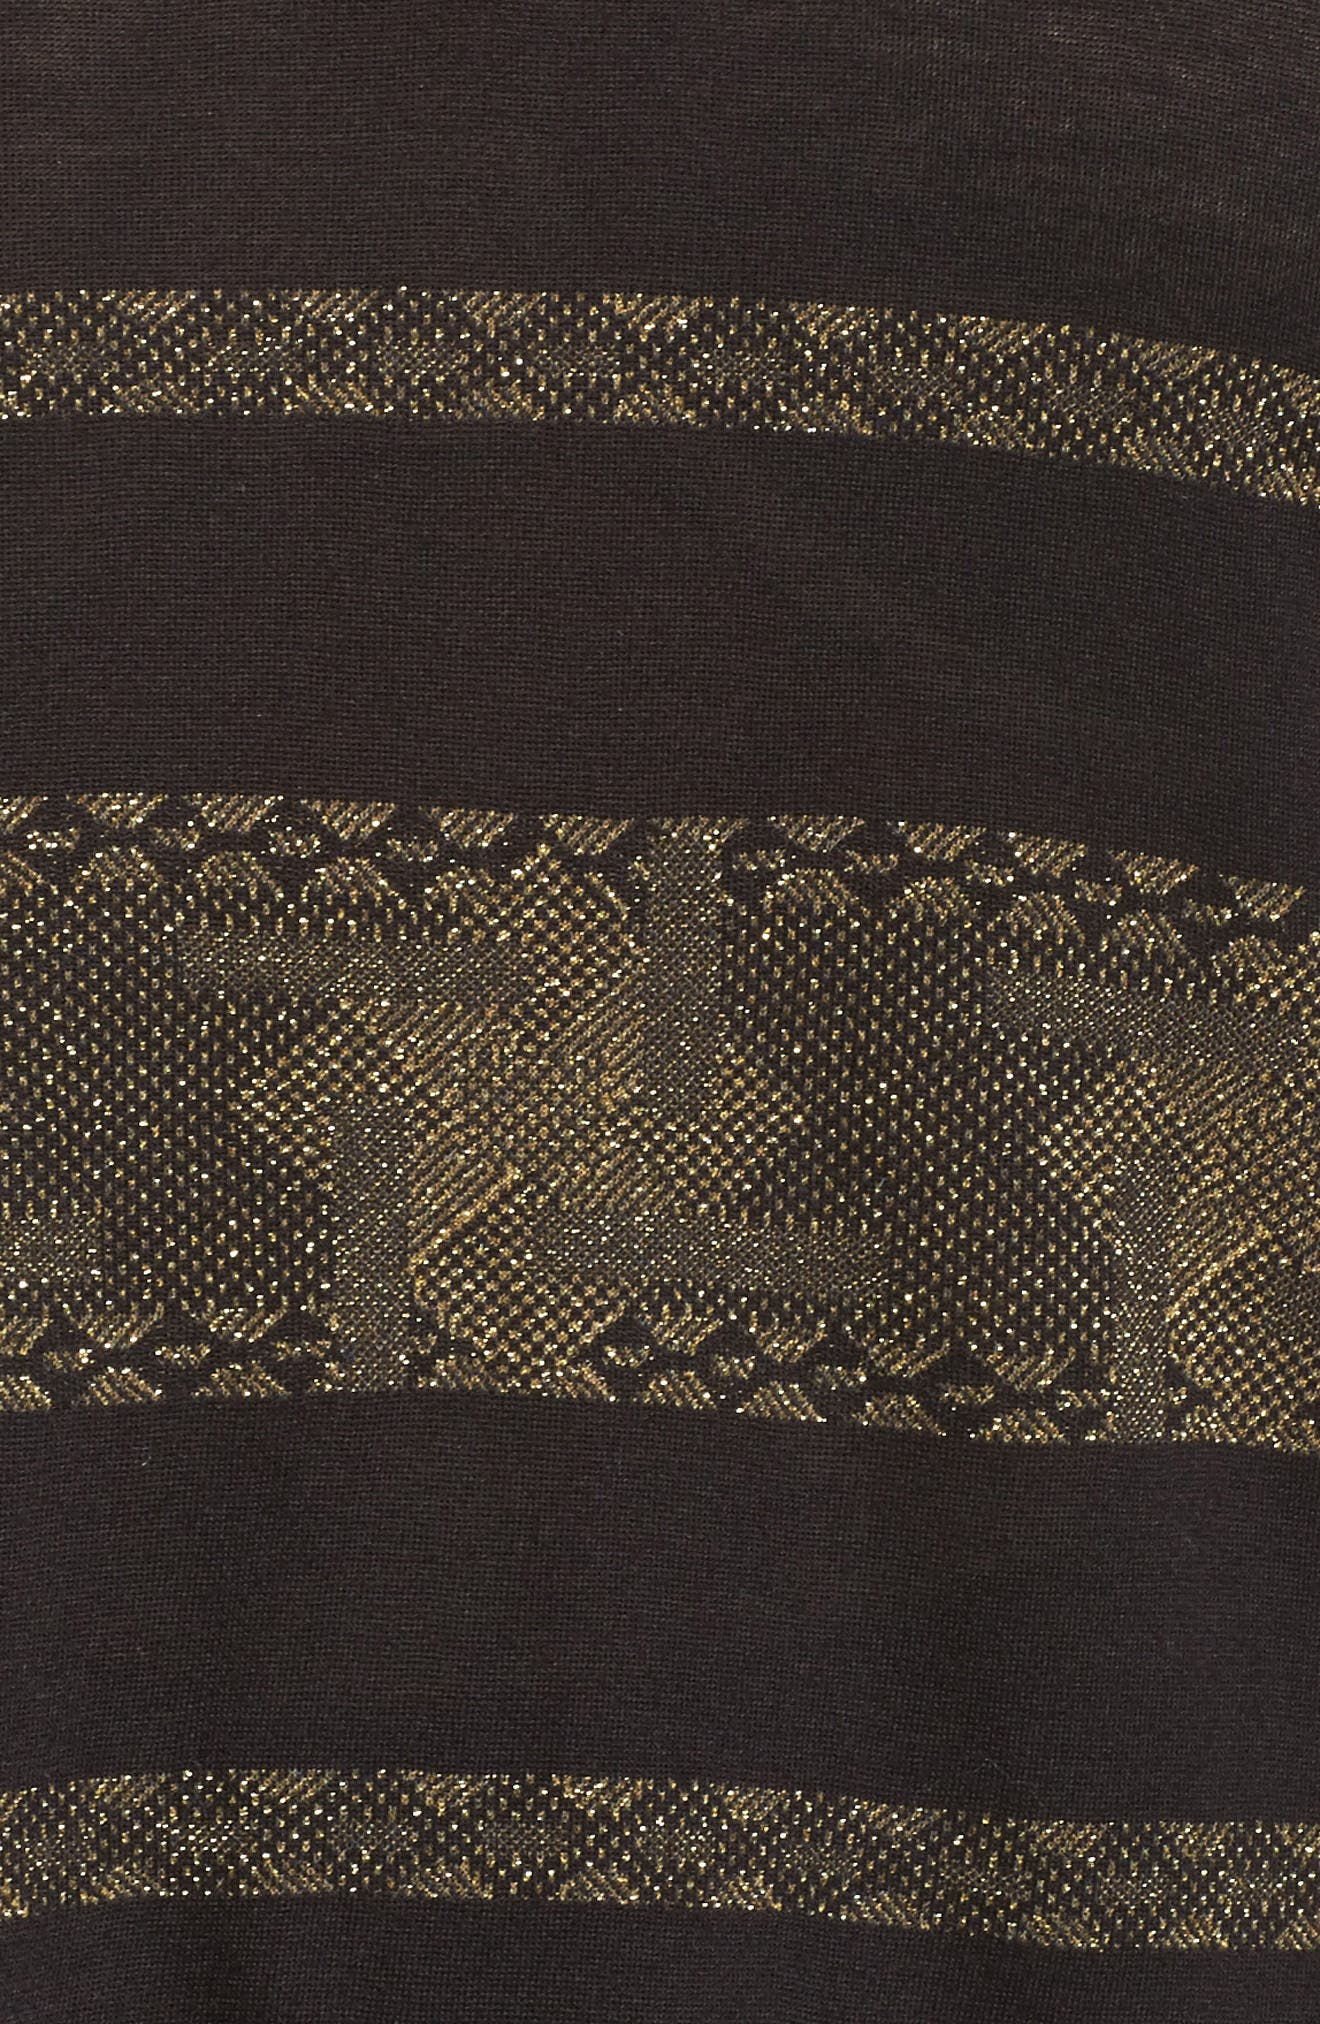 Metallic Stripe Tee,                             Alternate thumbnail 5, color,                             009